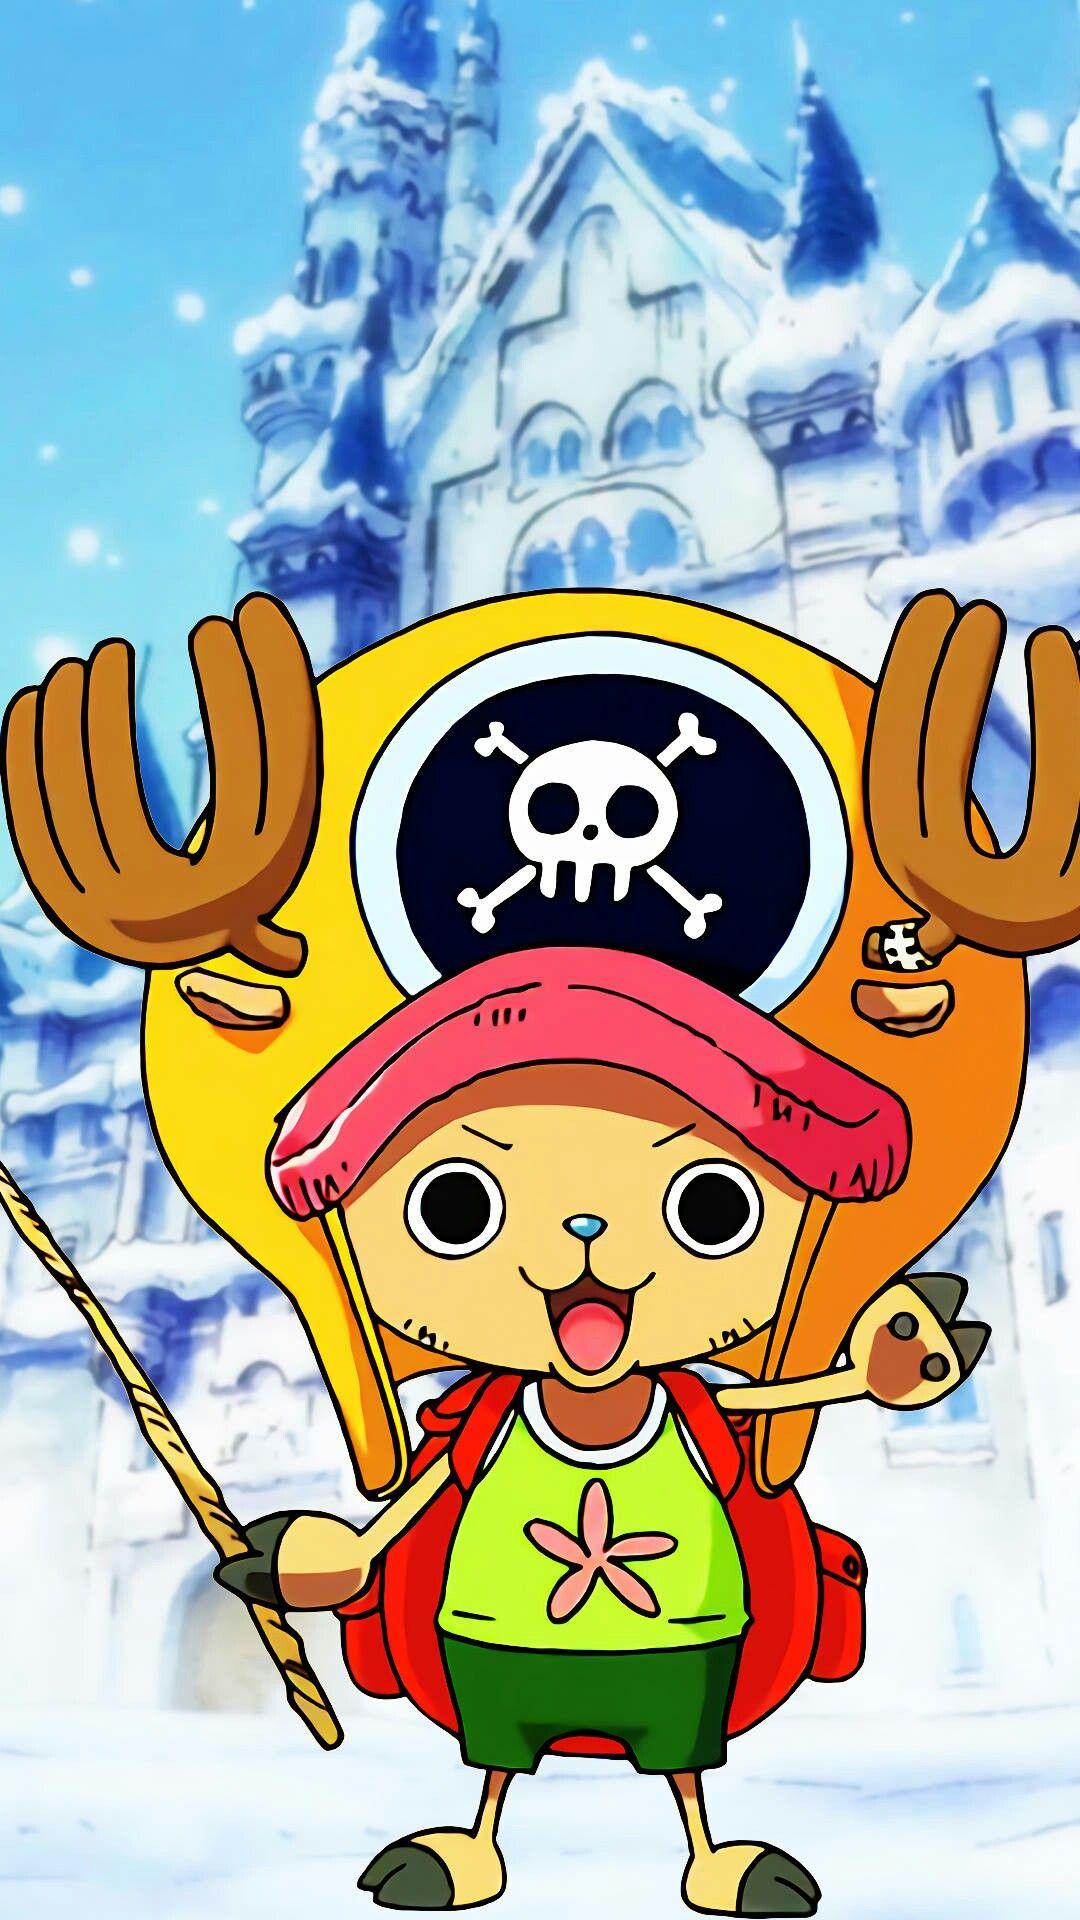 Cool One Piece Chopper Anime One Piece Anime